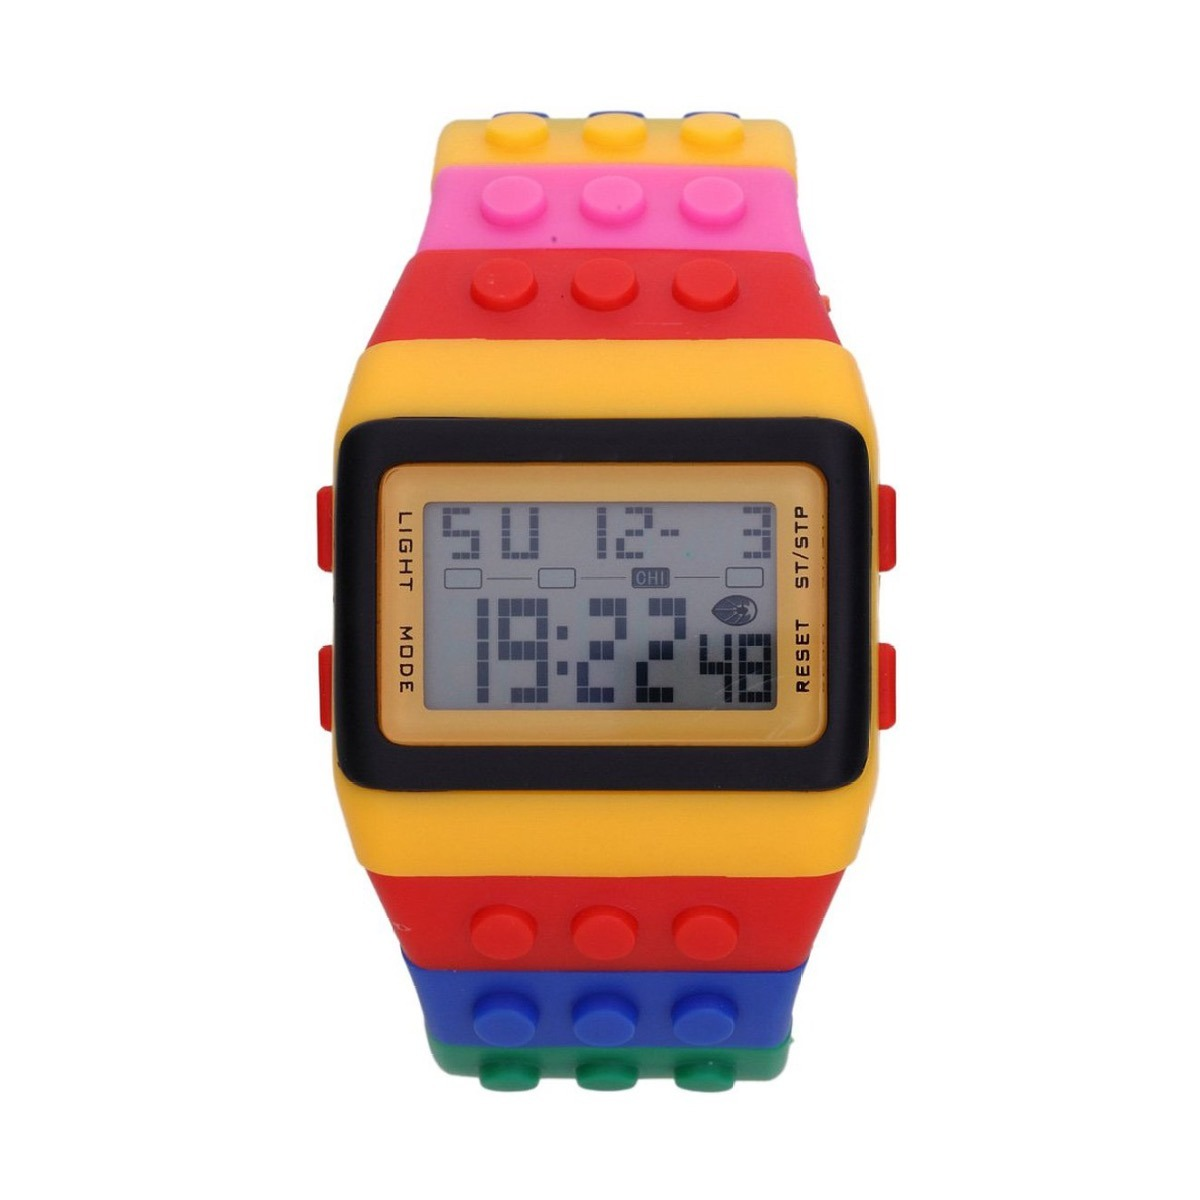 5b9efe0b837 kit 2 relógio digital adulto infantil lego frete gratis. Carregando zoom.